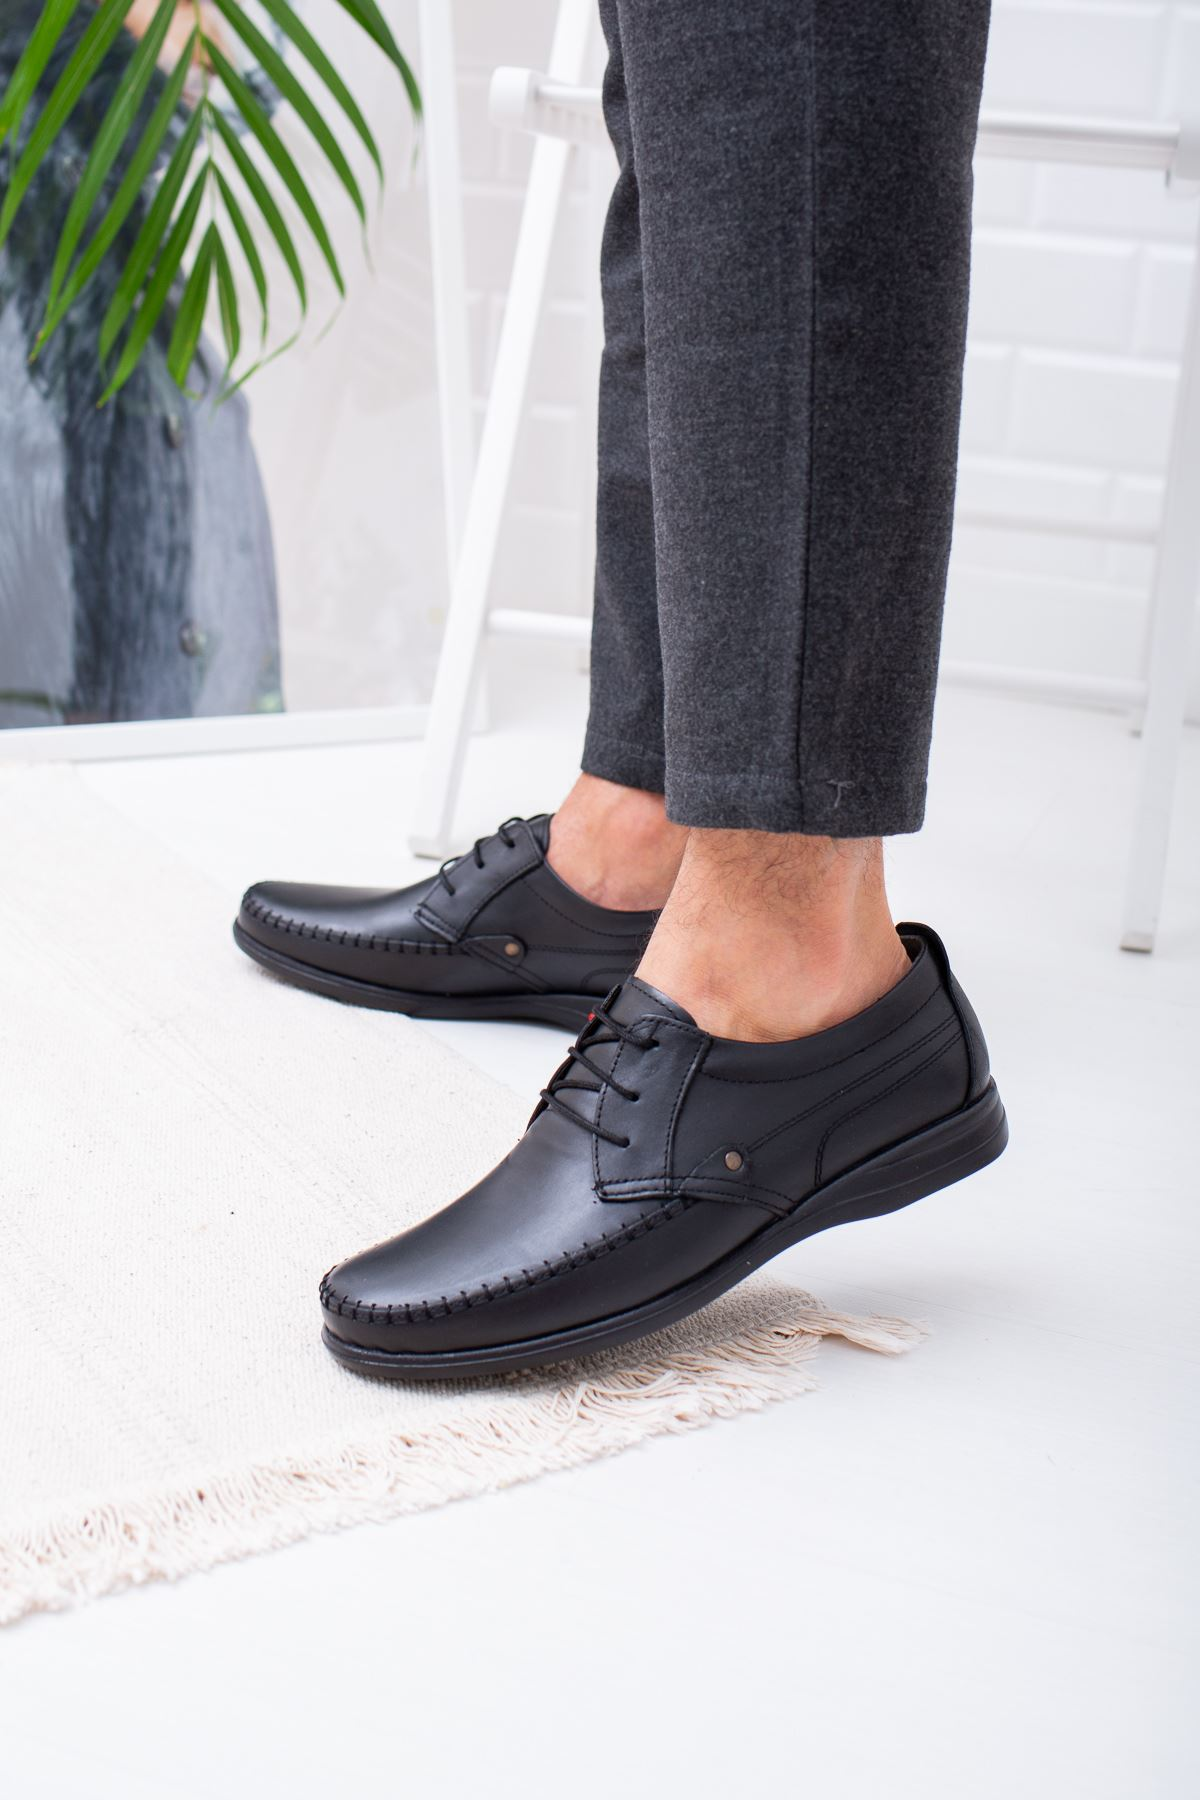 Ortapedik Pedli Siyah Deri Ayakkabı